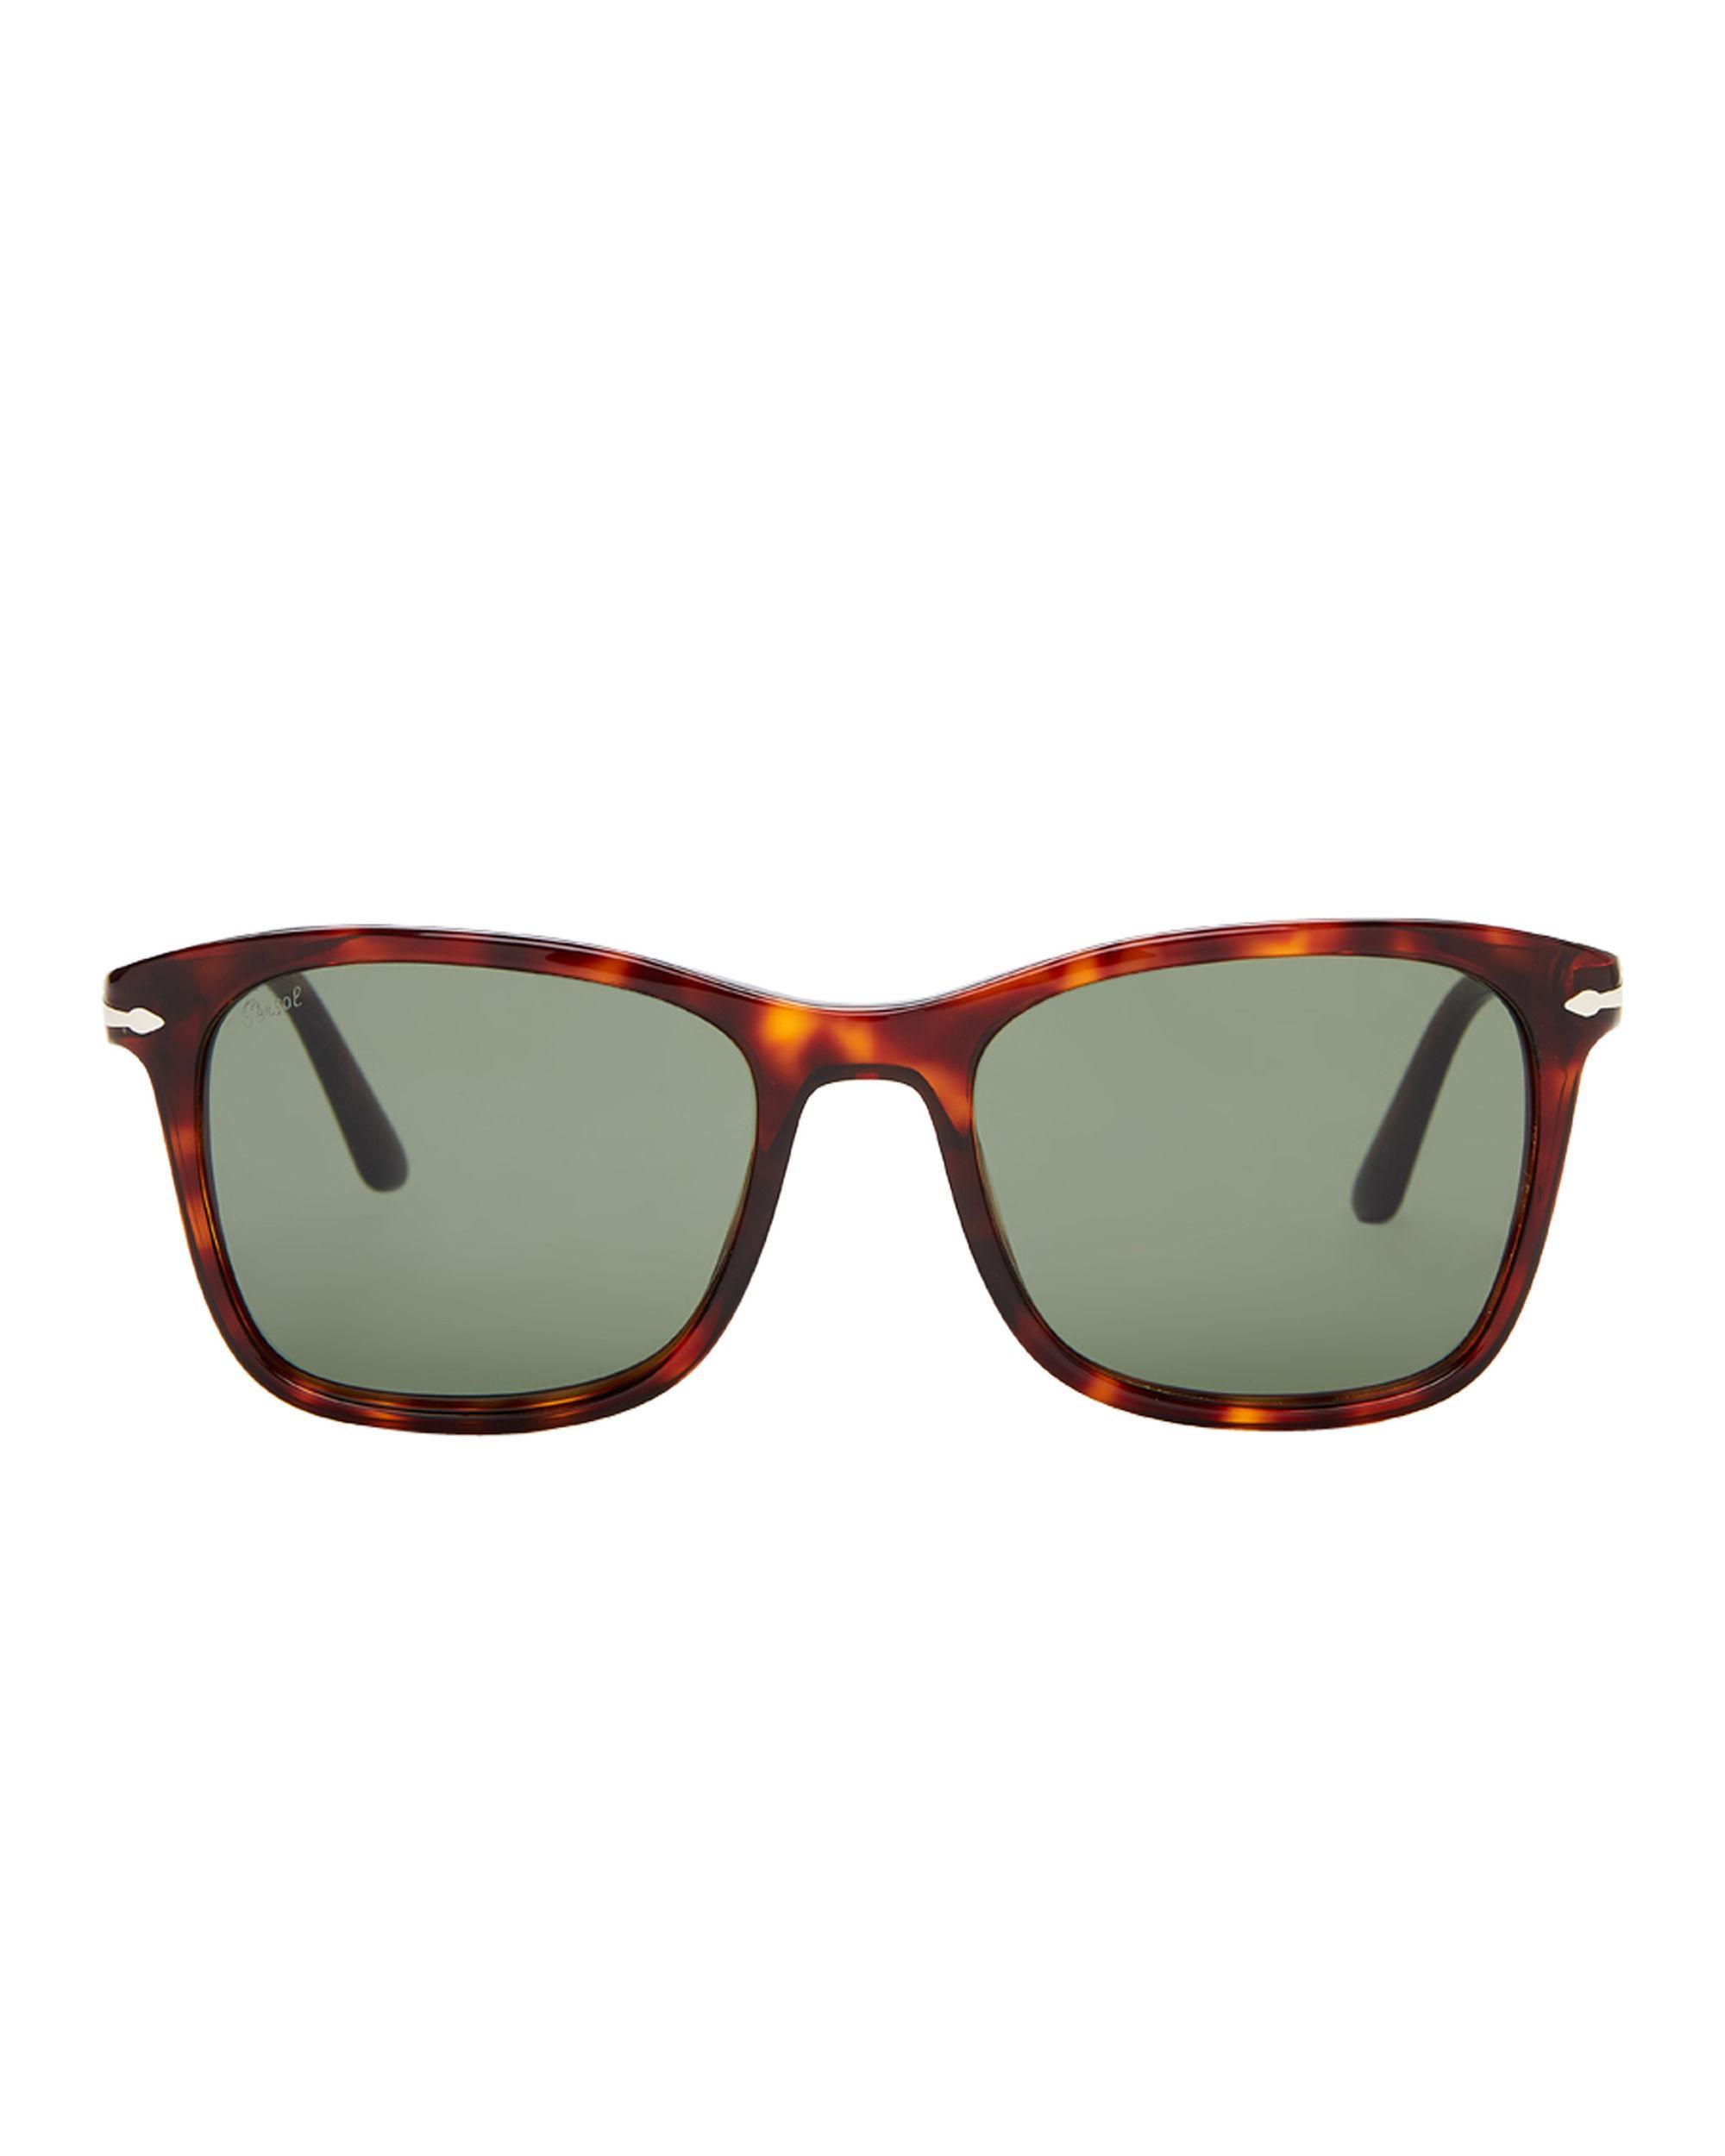 35889332ce Lyst - Persol Po3192-s Tortoiseshell-look Square Sunglasses in Brown for Men